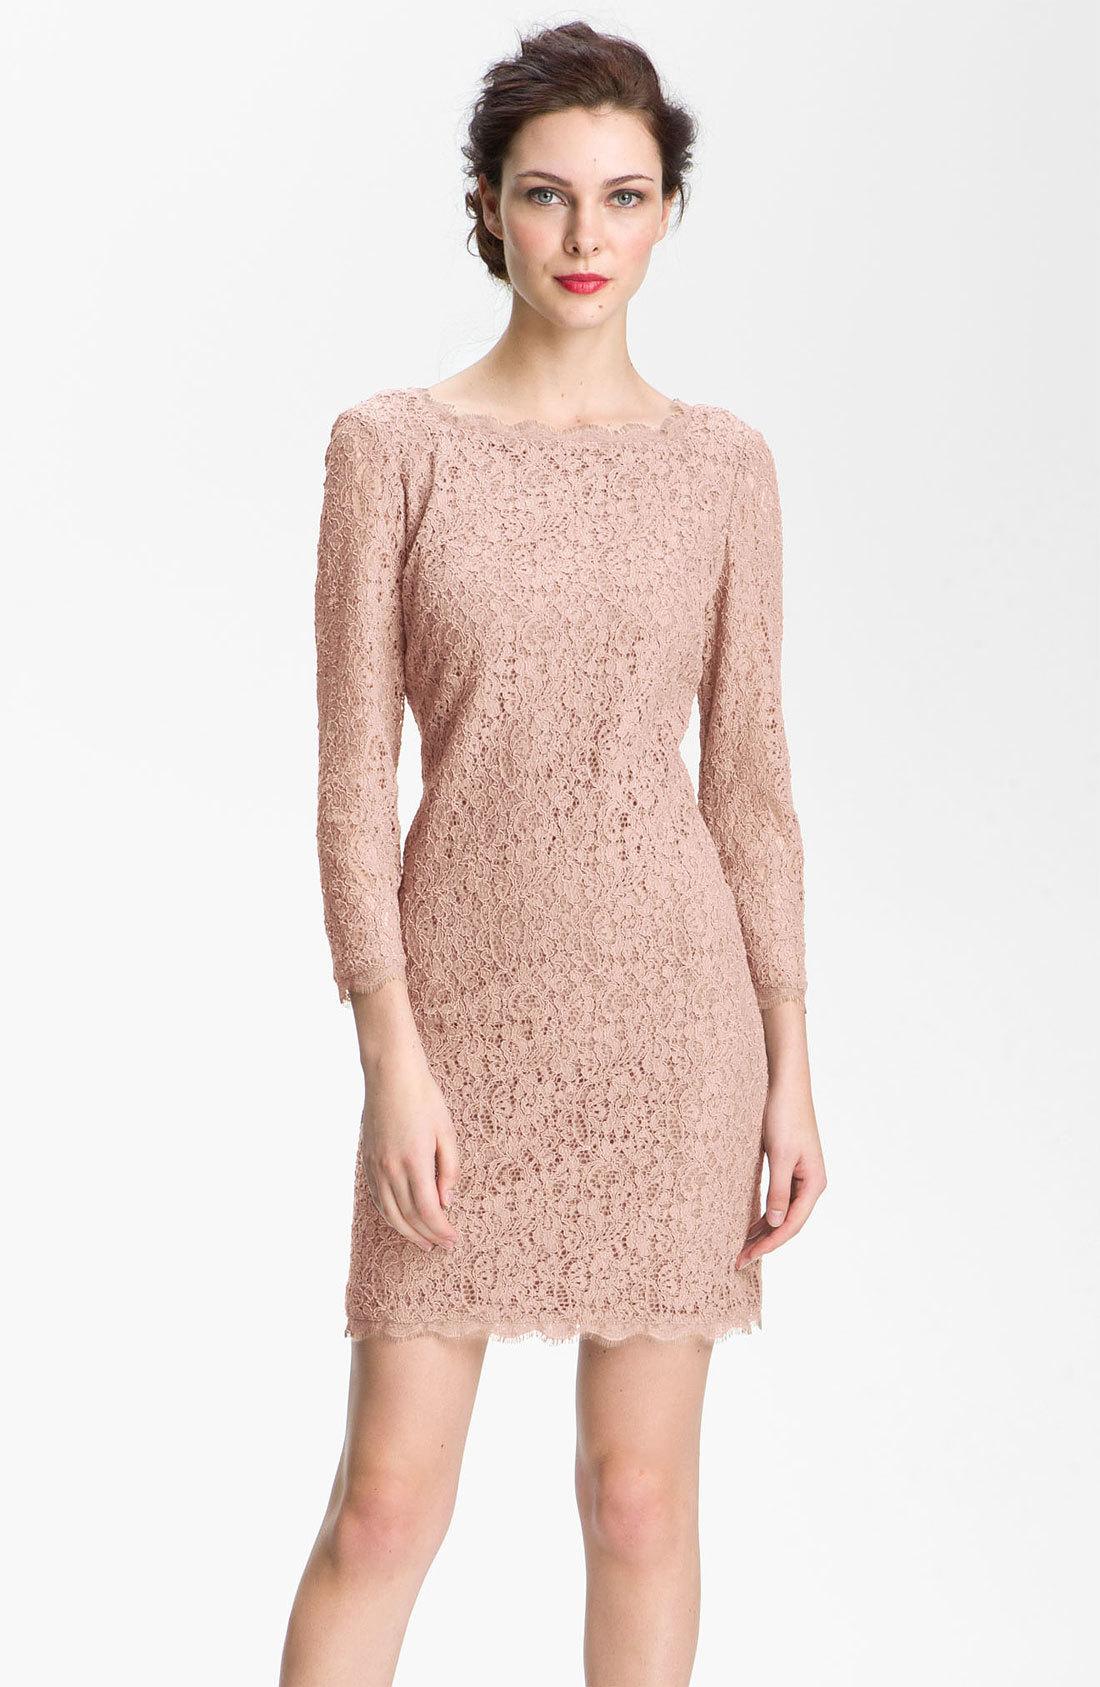 Adrianna Papell Blush Lace Dress